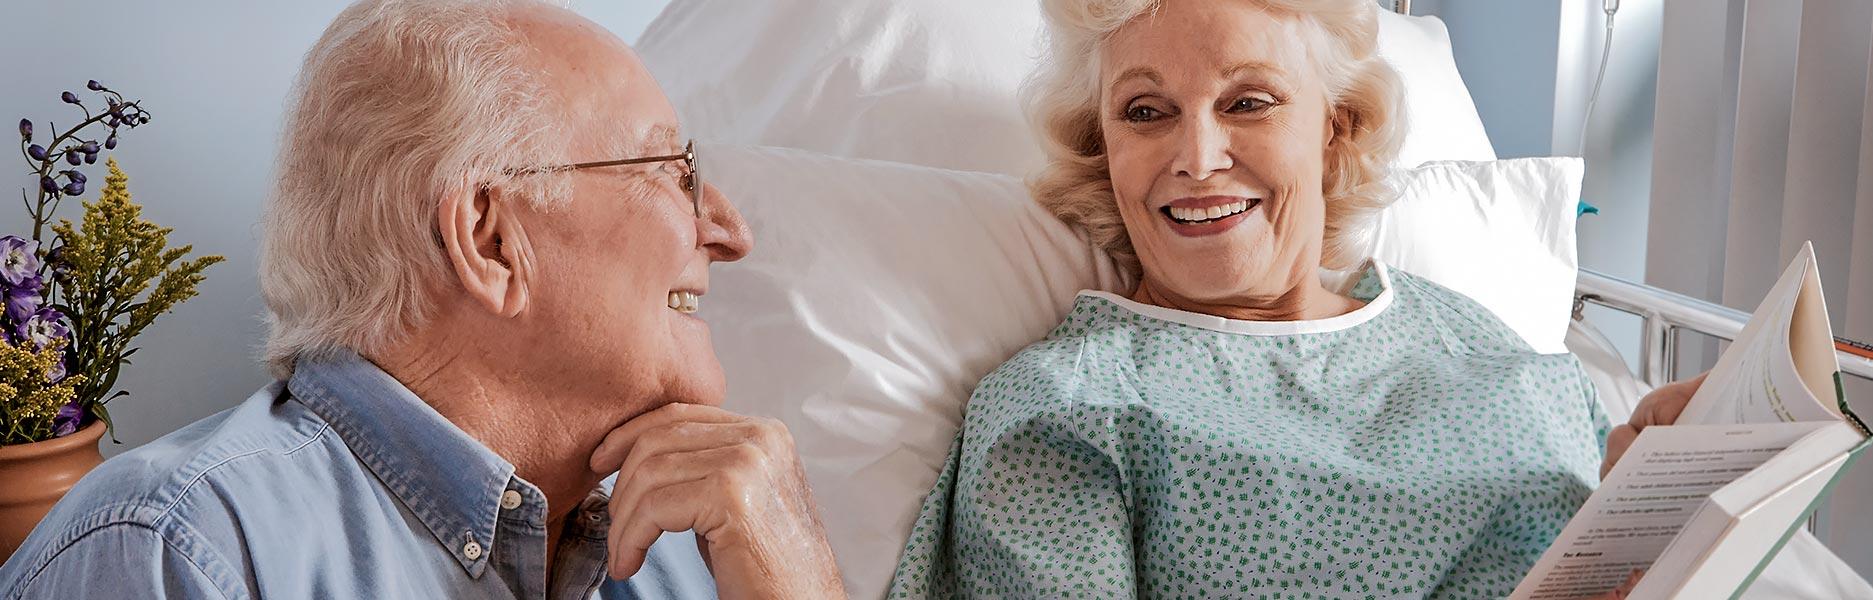 Lachendes älteres Ehepaar, Frau liegt im Pflegebett